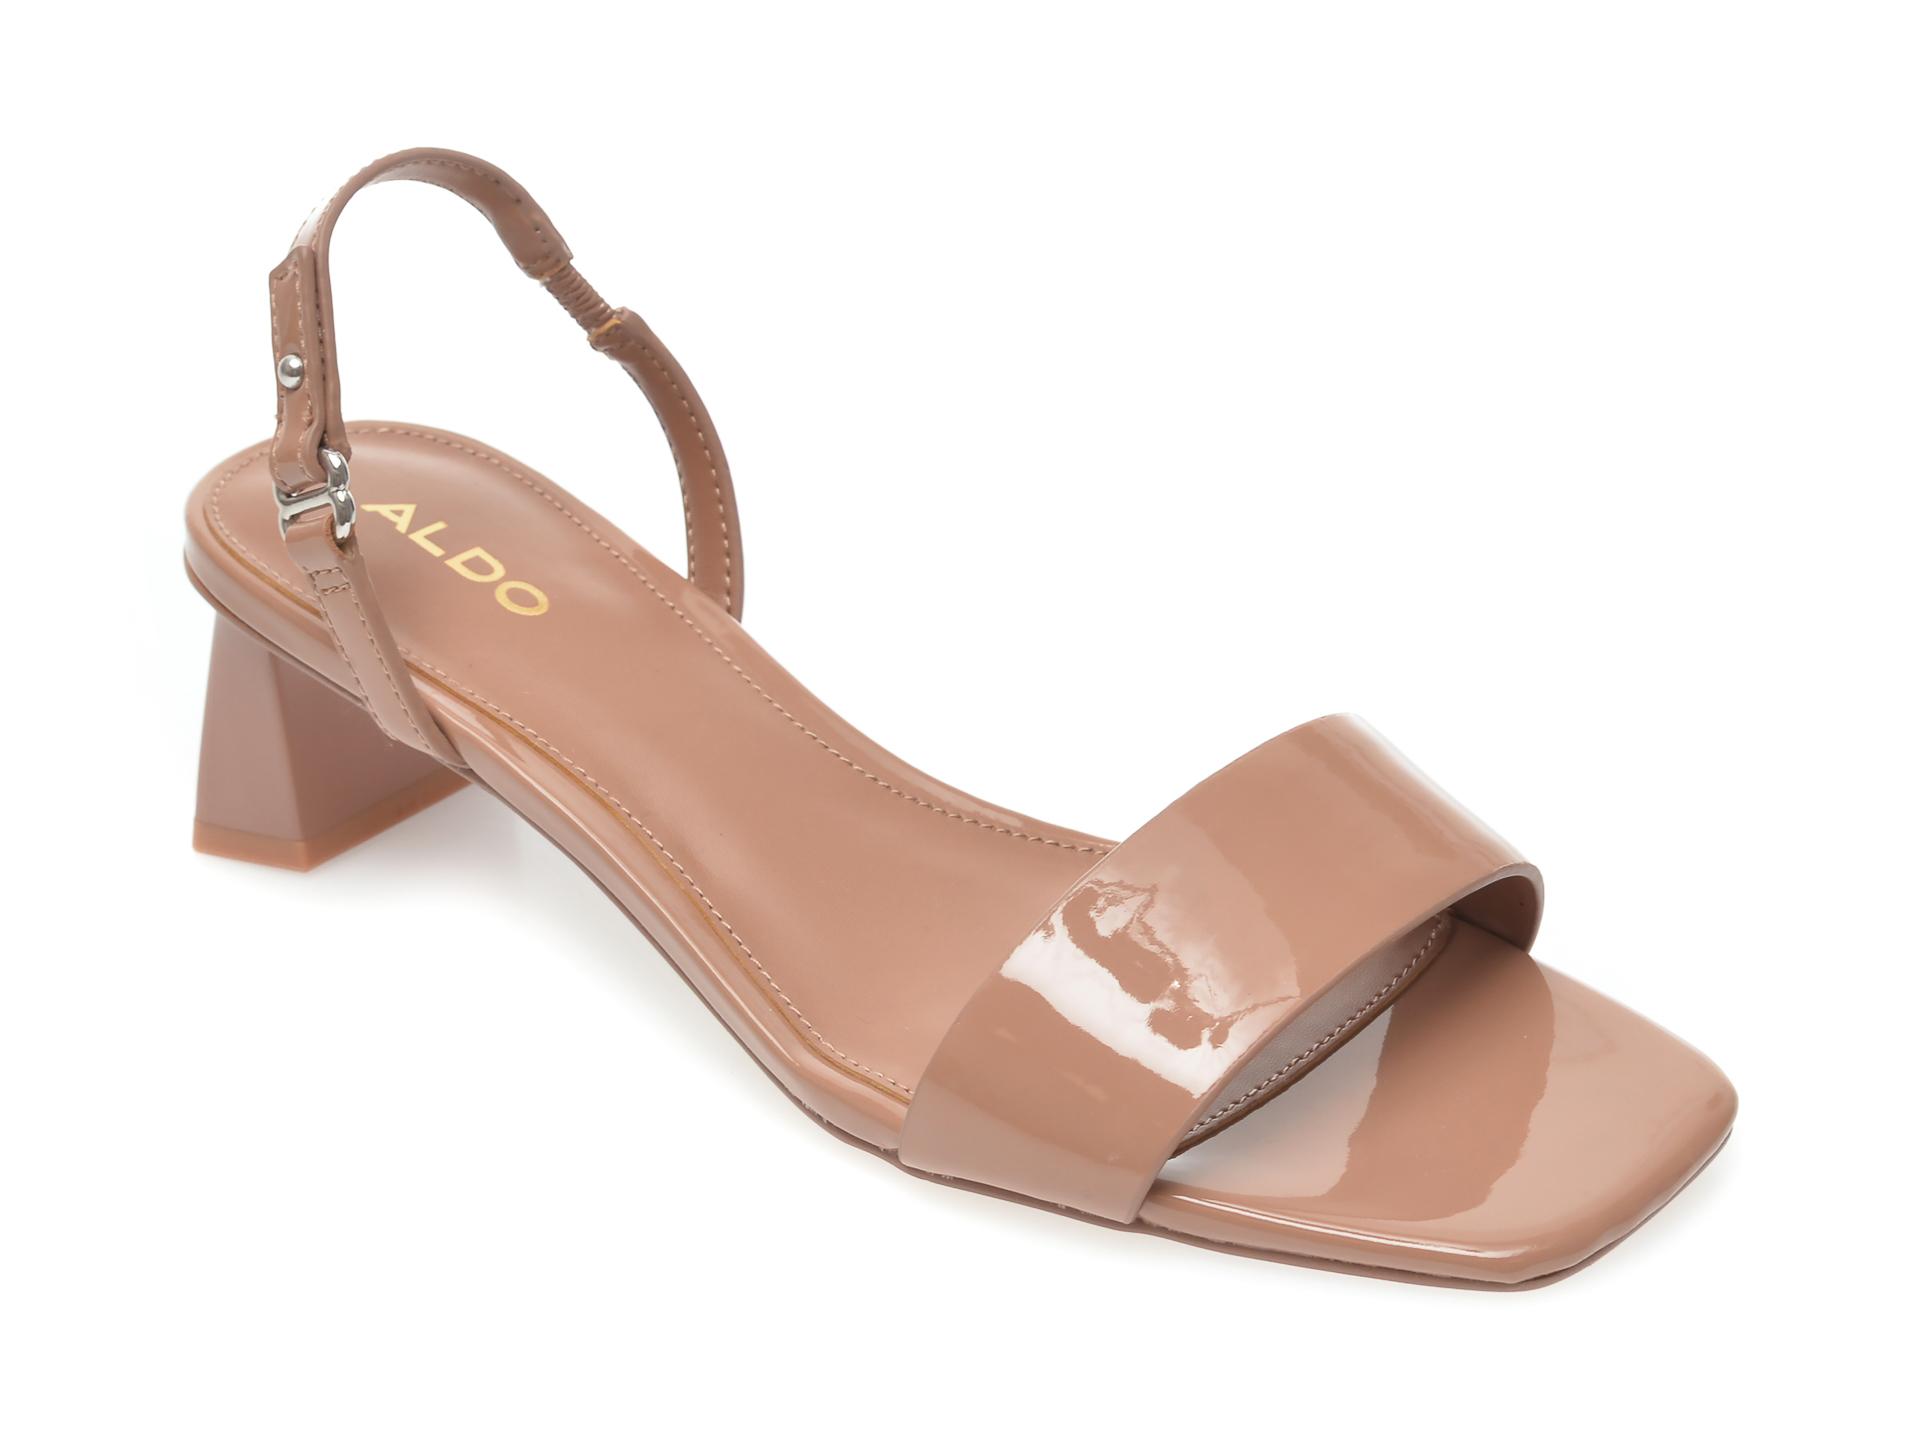 Sandale ALDO maro, Tysen200, din piele ecologica New